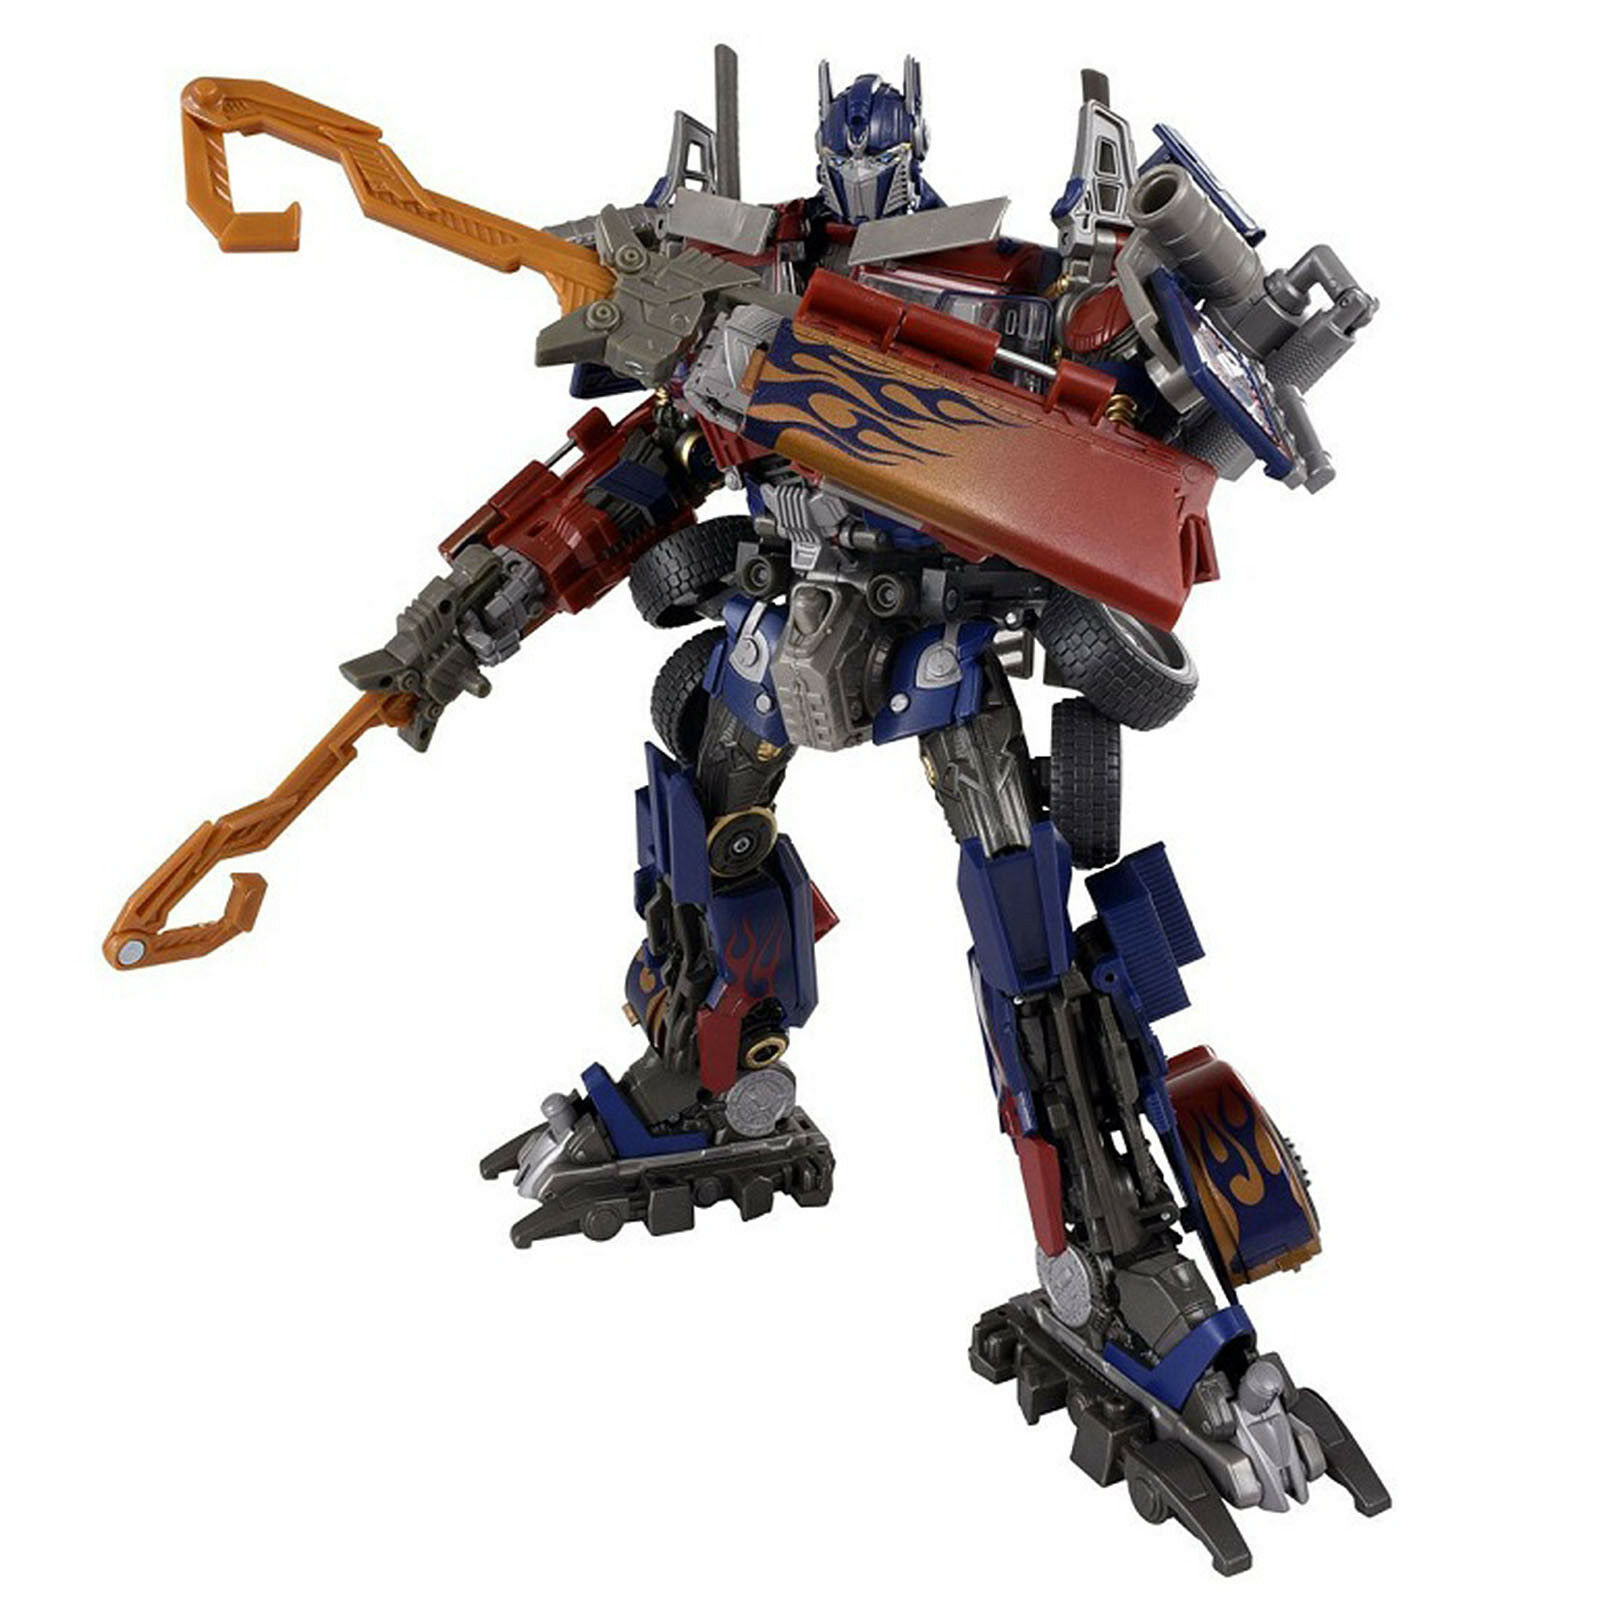 Transformers film Best MB - 17 Optimus vengative